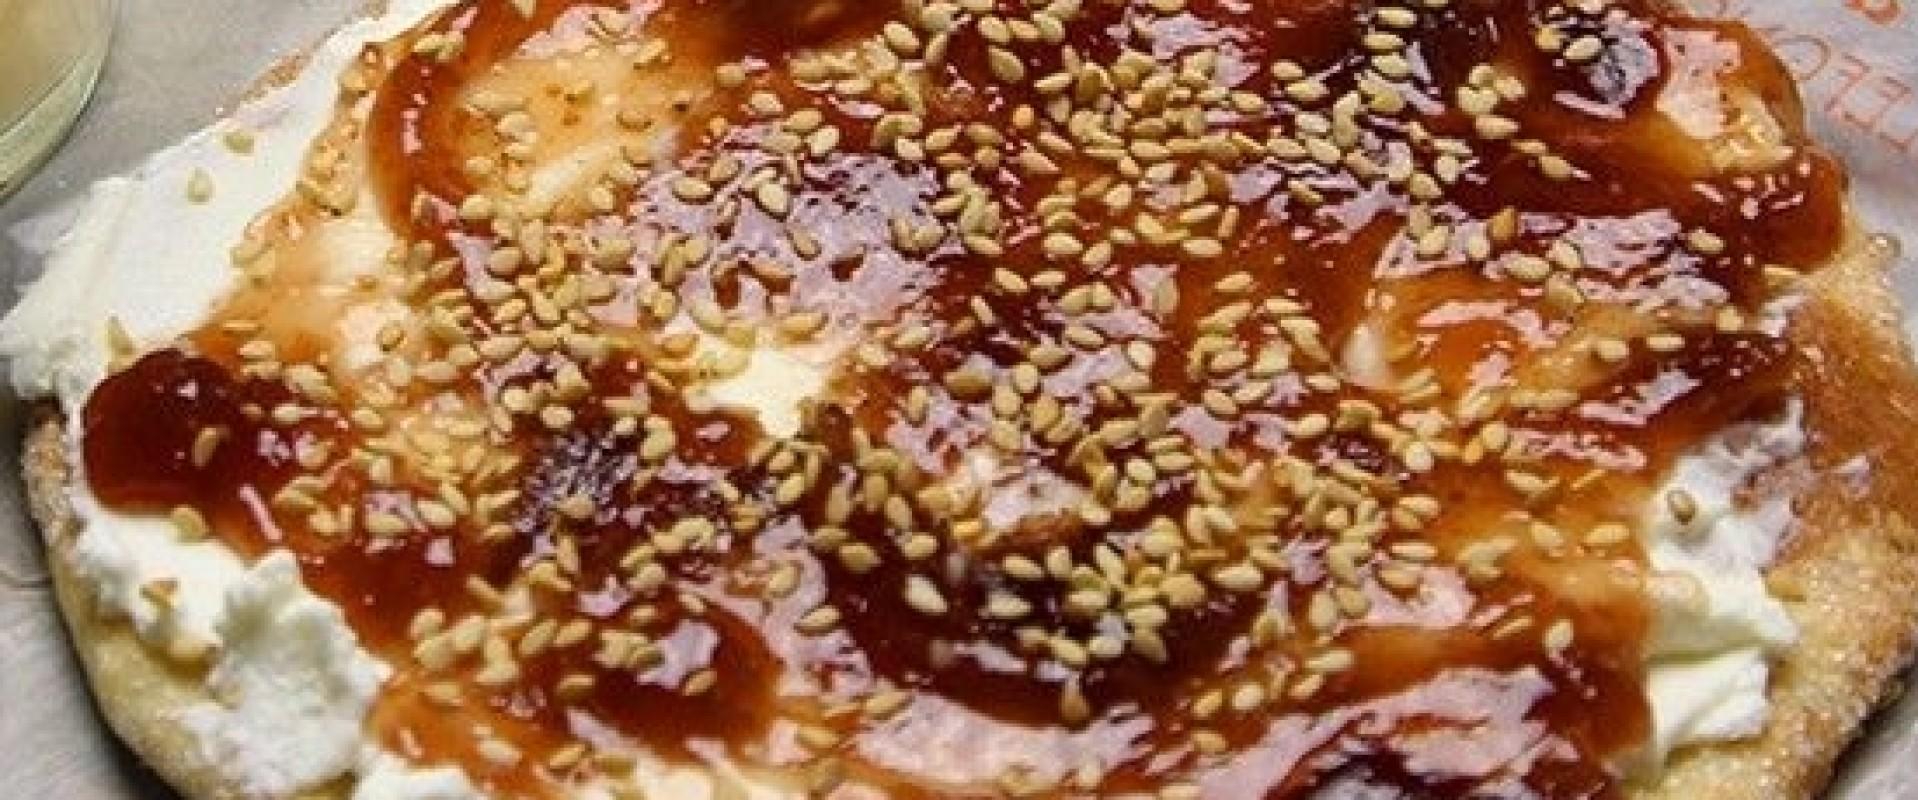 Ines Rosales Sinaasappel koek met kwark en vijgenjam